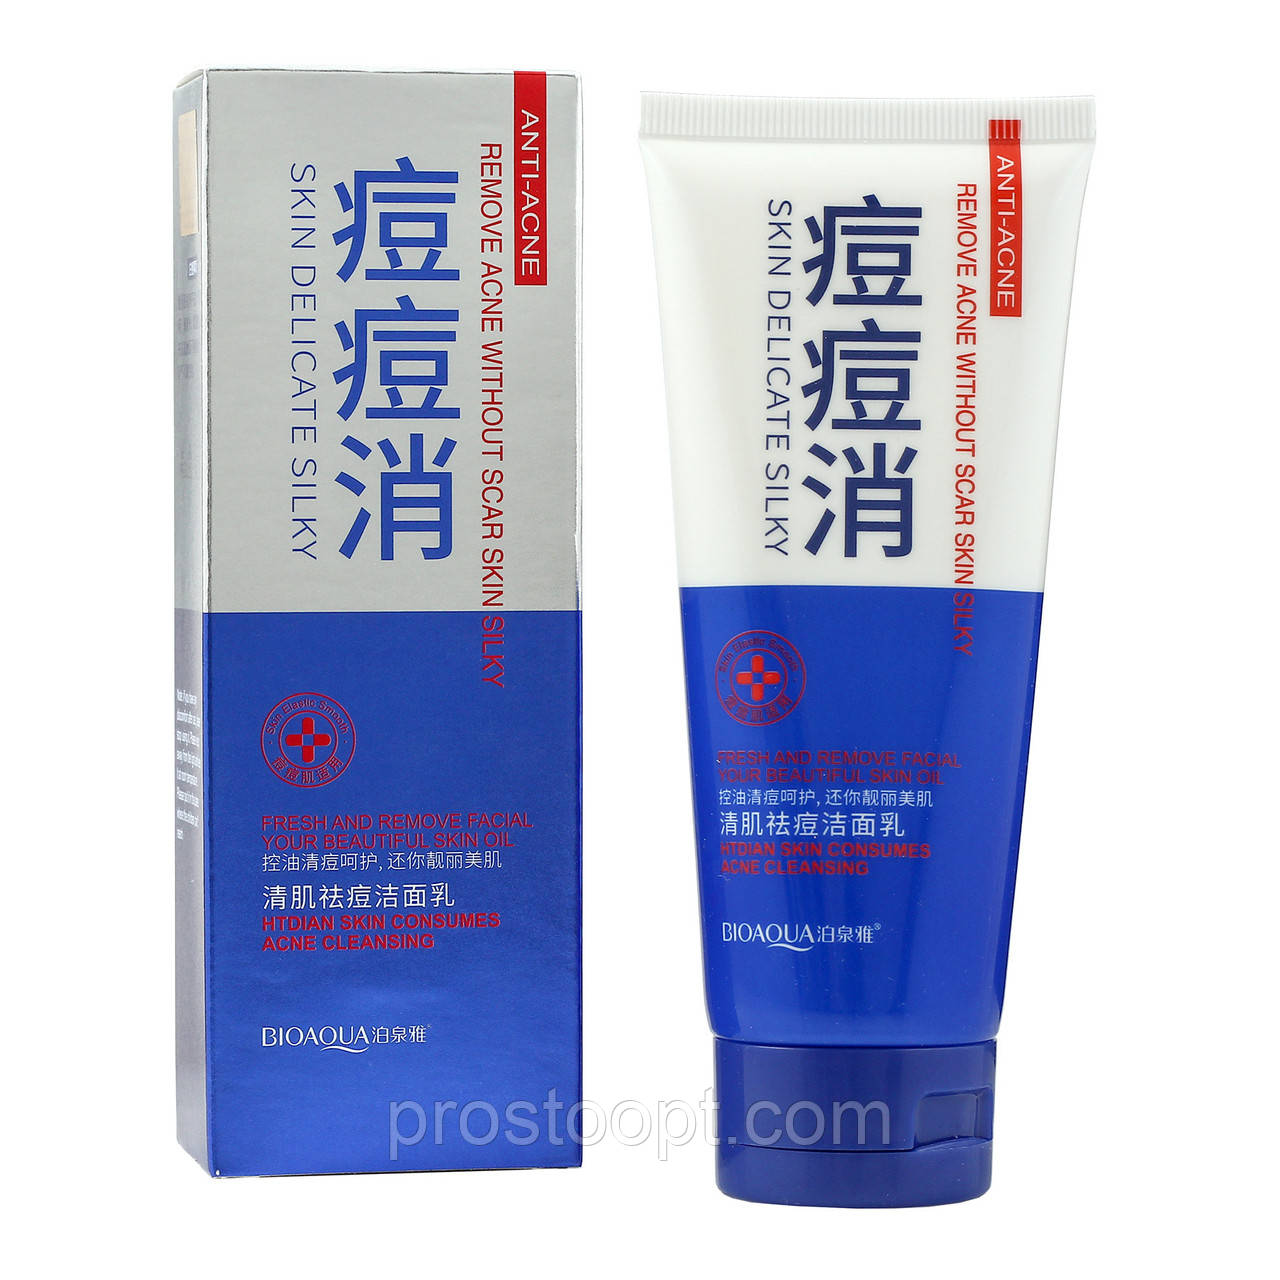 Пенка для умывания BioAqua Anti-Acne